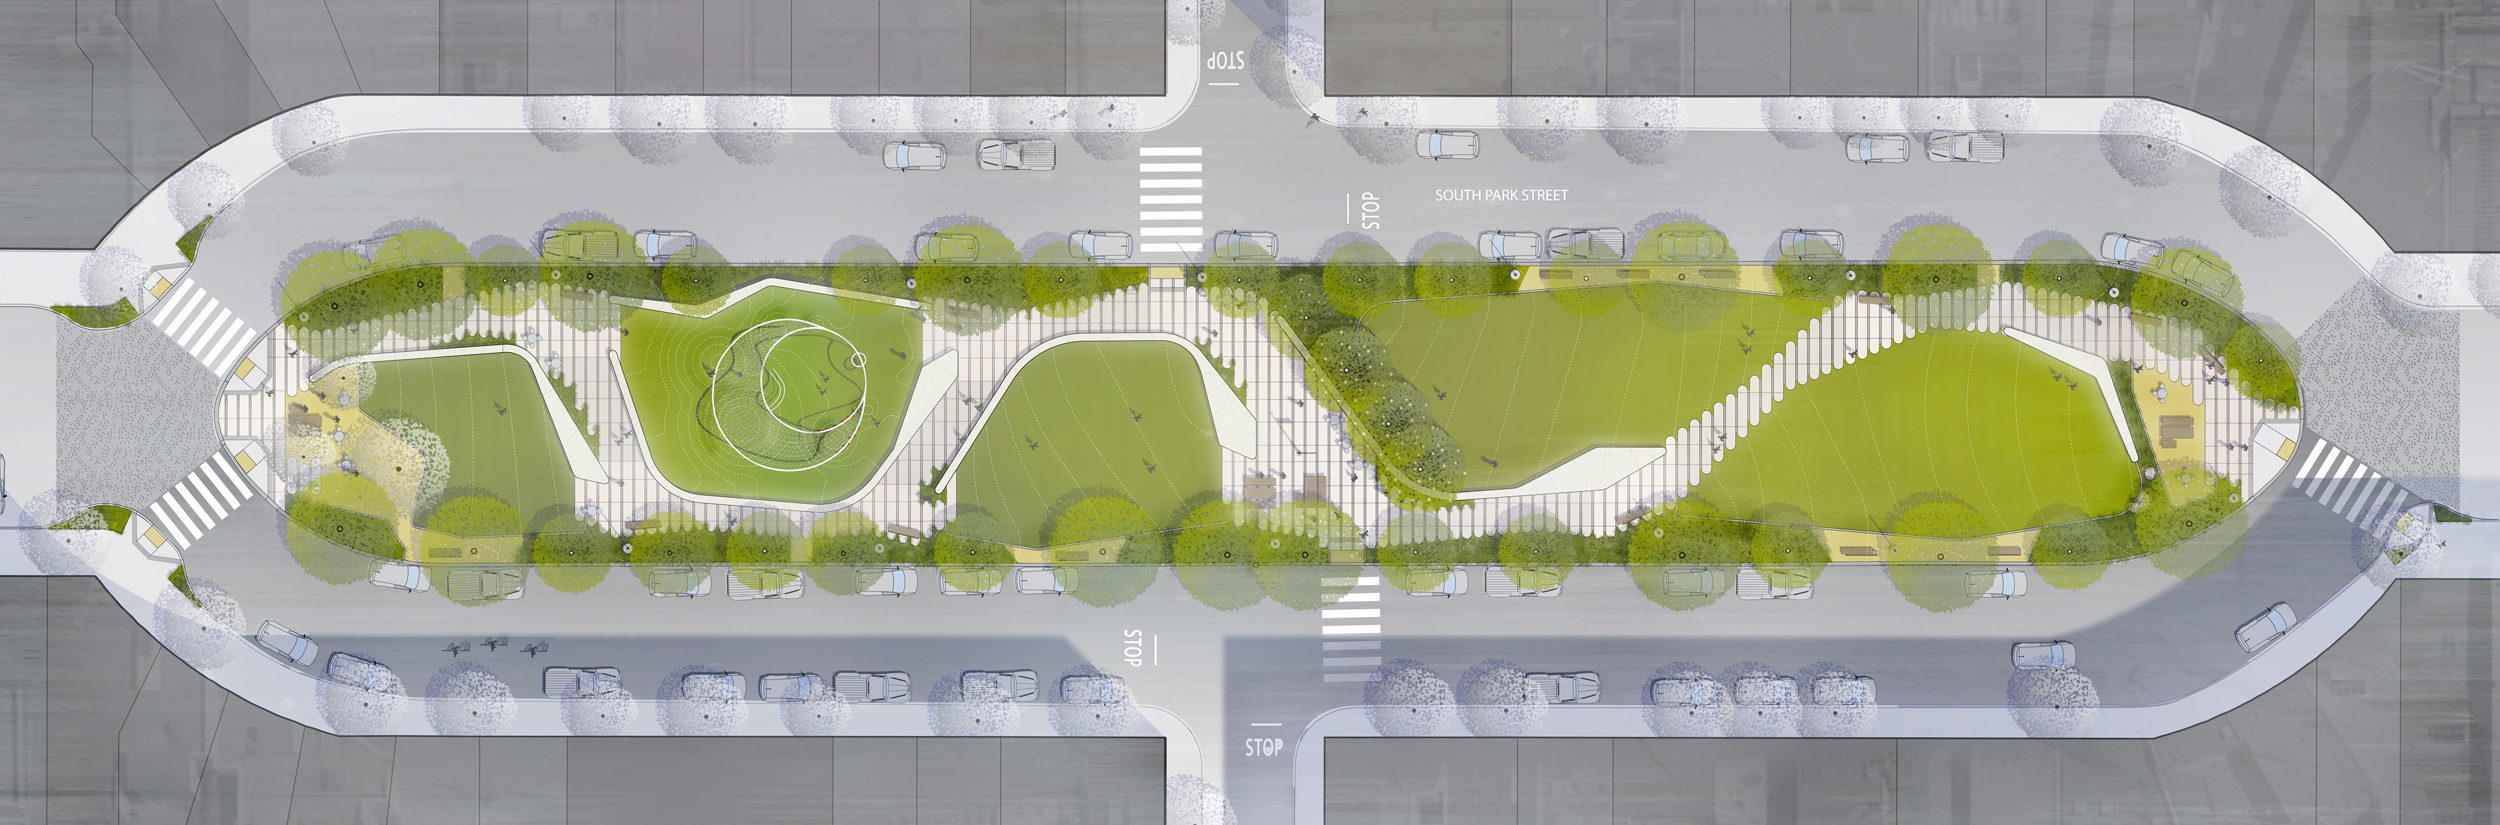 South Park - Site Plan Final-11x17.jpg